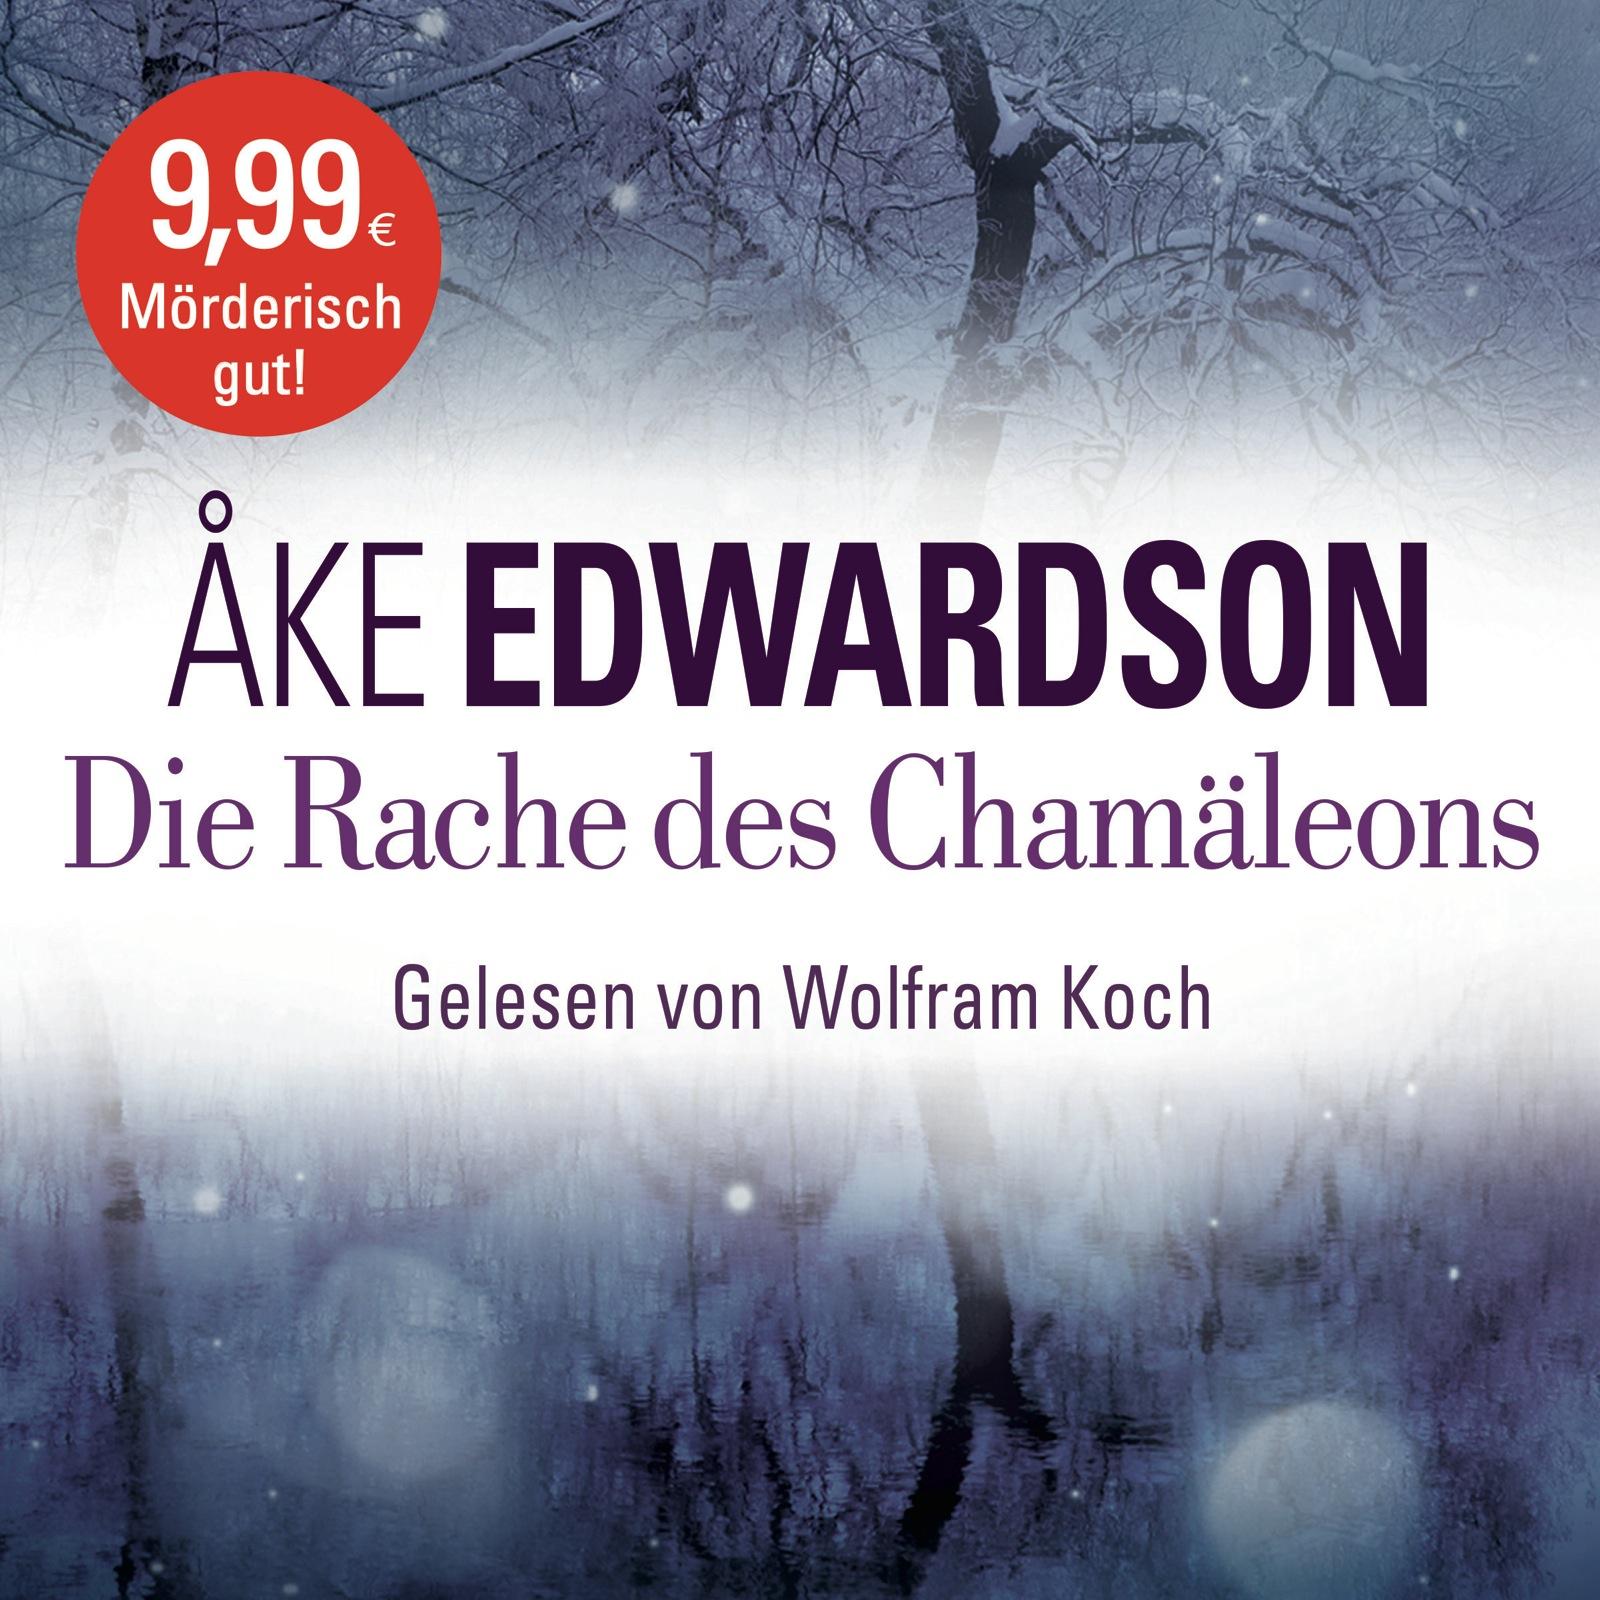 Die Rache des Chamäleons - Åke Edwardson [6 Audio CDs]